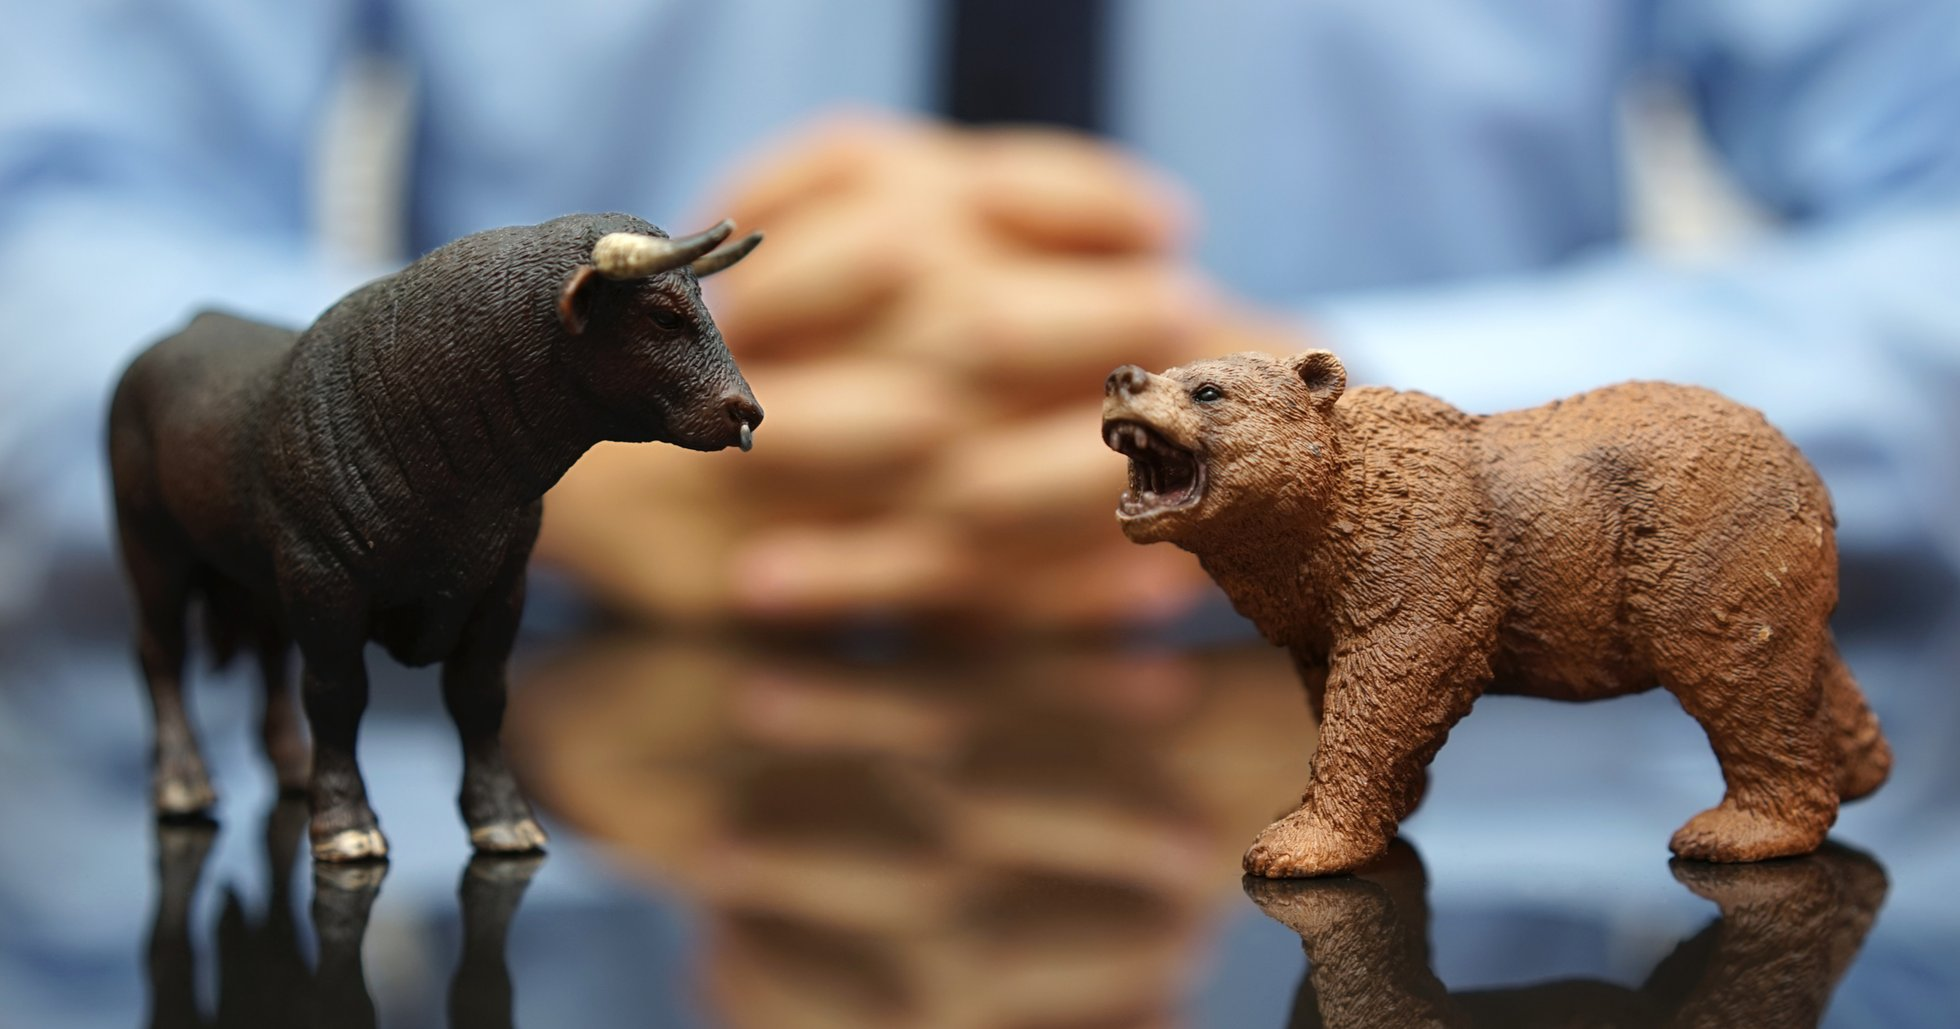 Bitcoinpriset beter sig volatilt – har fallit över 400 dollar sedan i går.